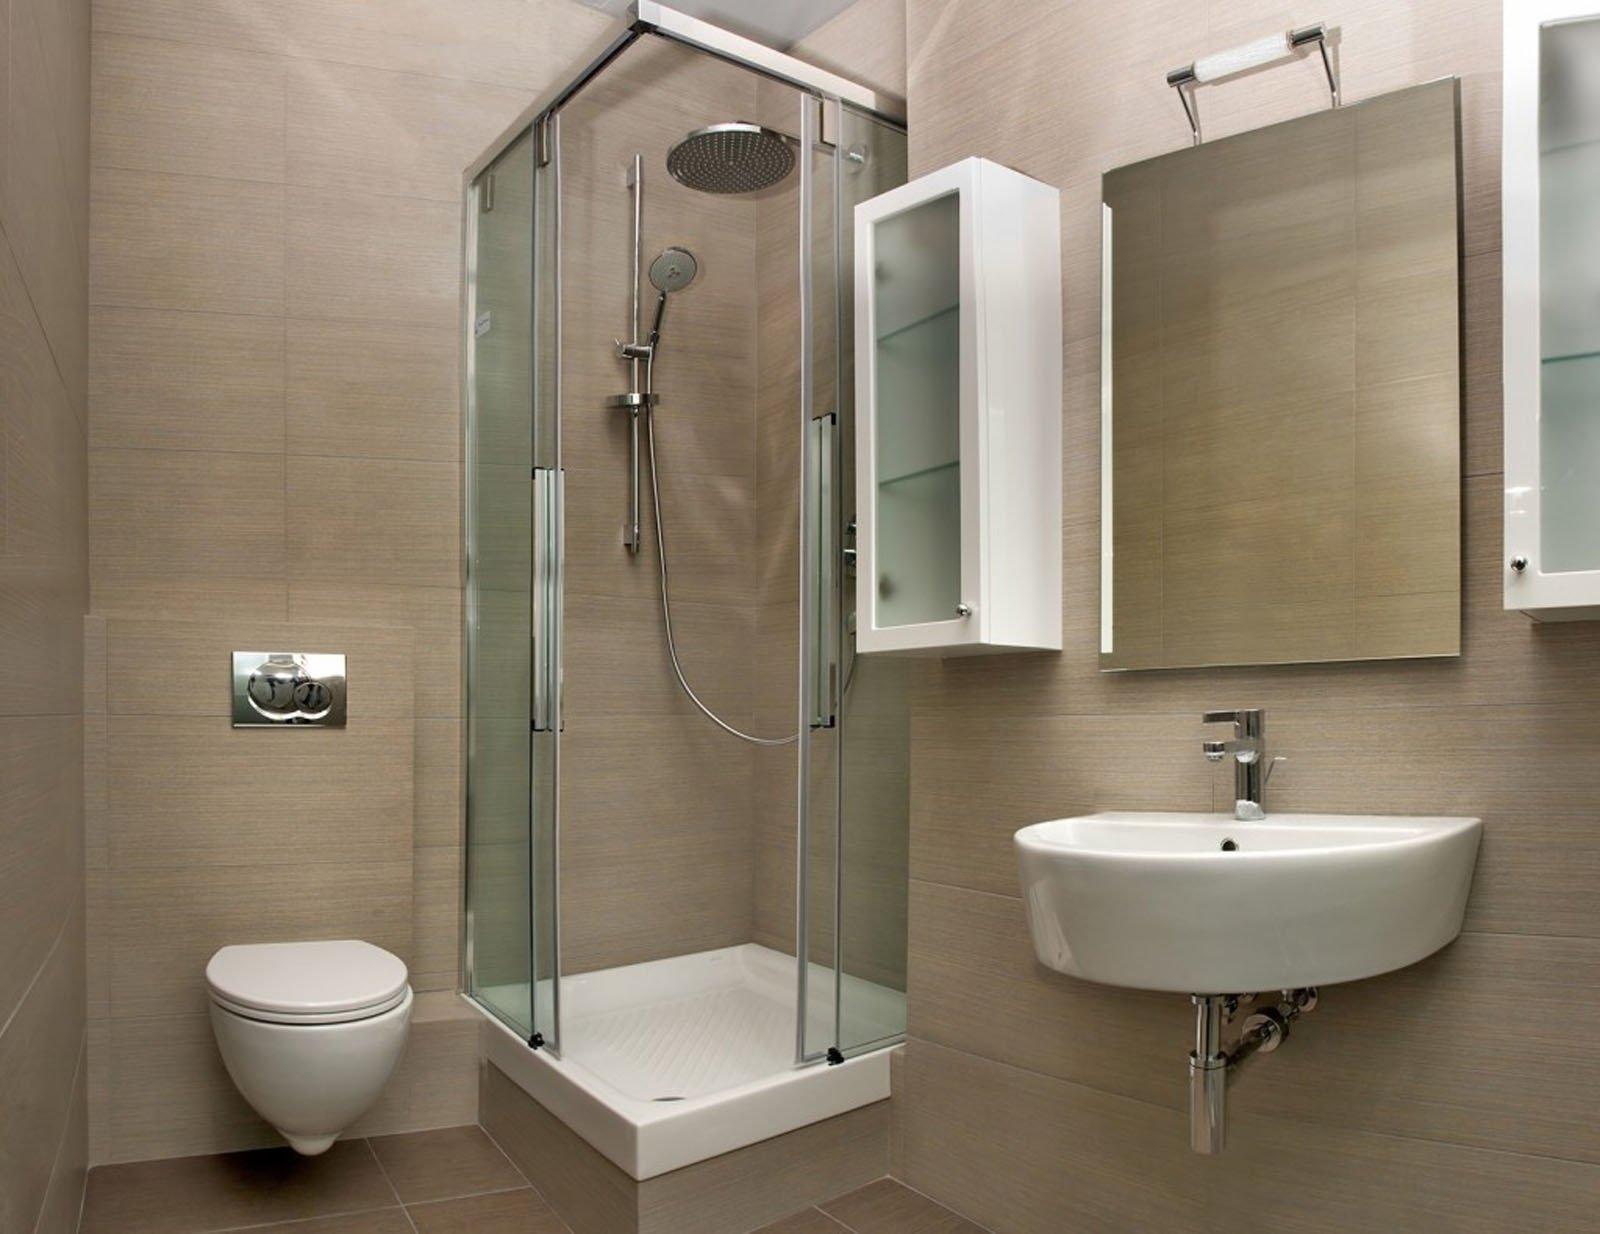 10 Fantastic Cheap Bathroom Remodel Ideas For Small Bathrooms cheap bathroom remodel ideas for small bathrooms room design ideas 1 2020